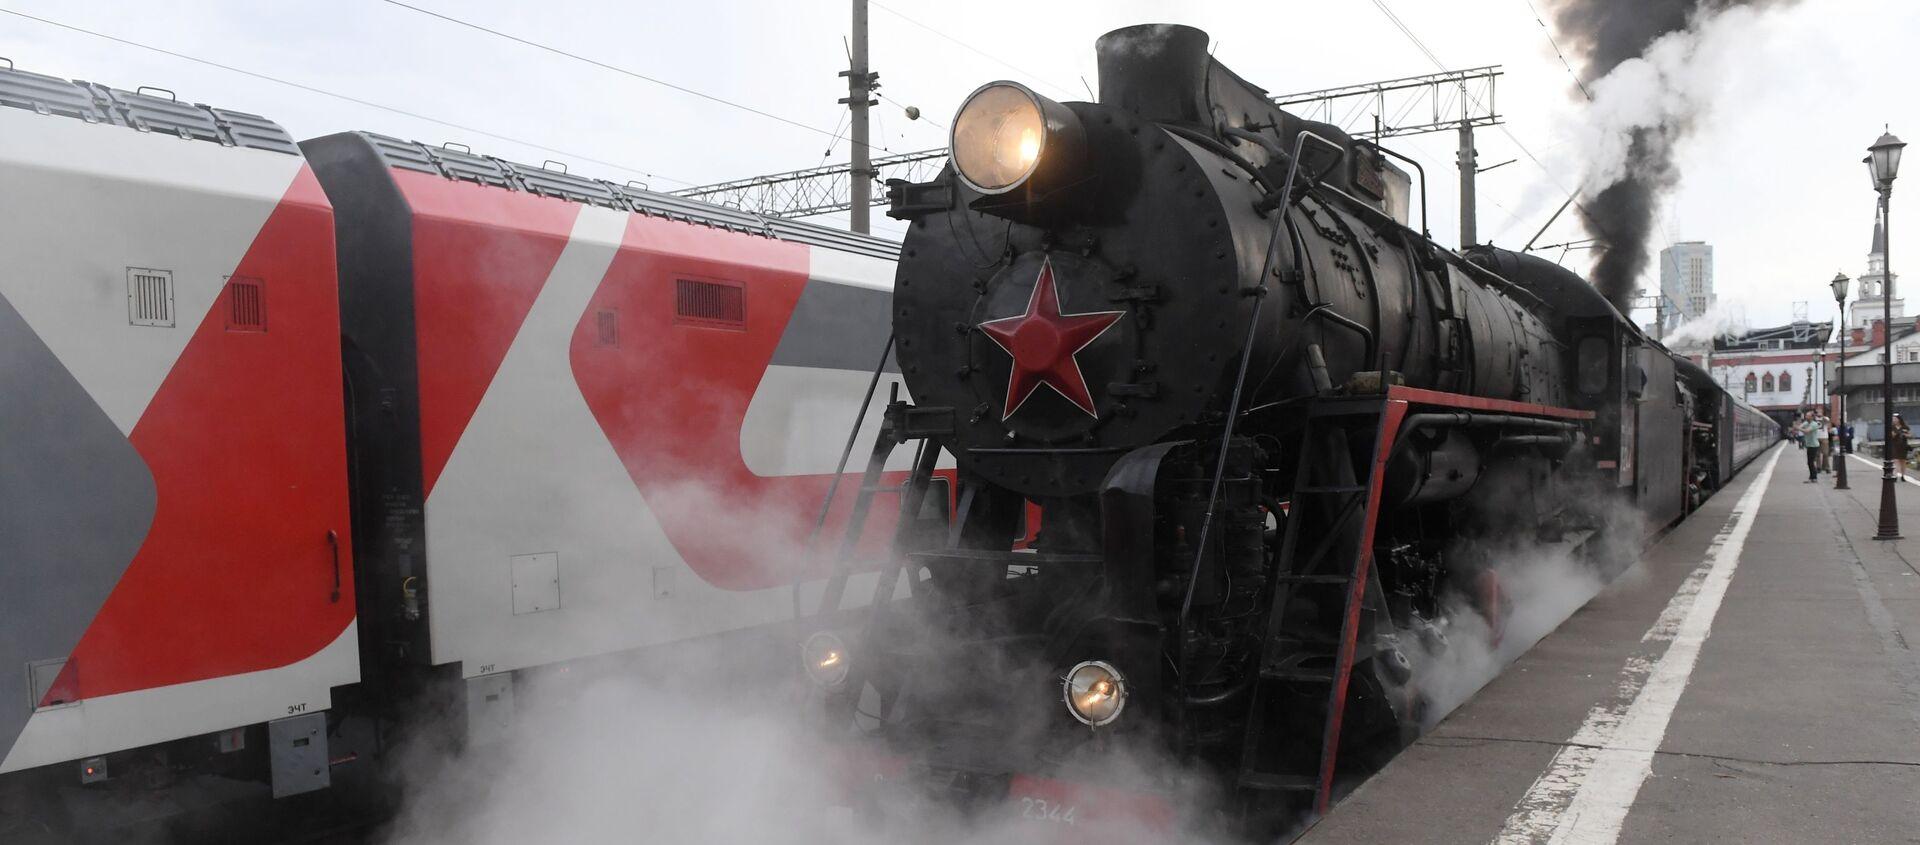 El tren Rusia Imperial - Sputnik Mundo, 1920, 01.07.2019